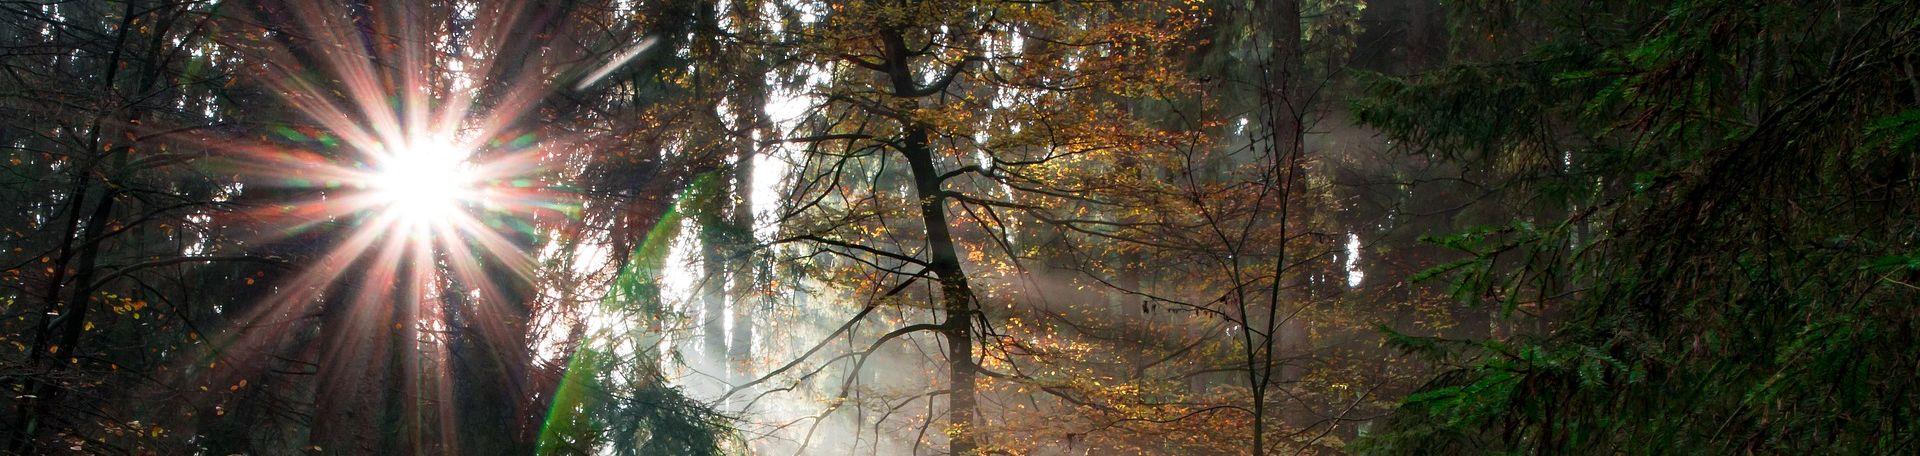 naturpark-flaeming